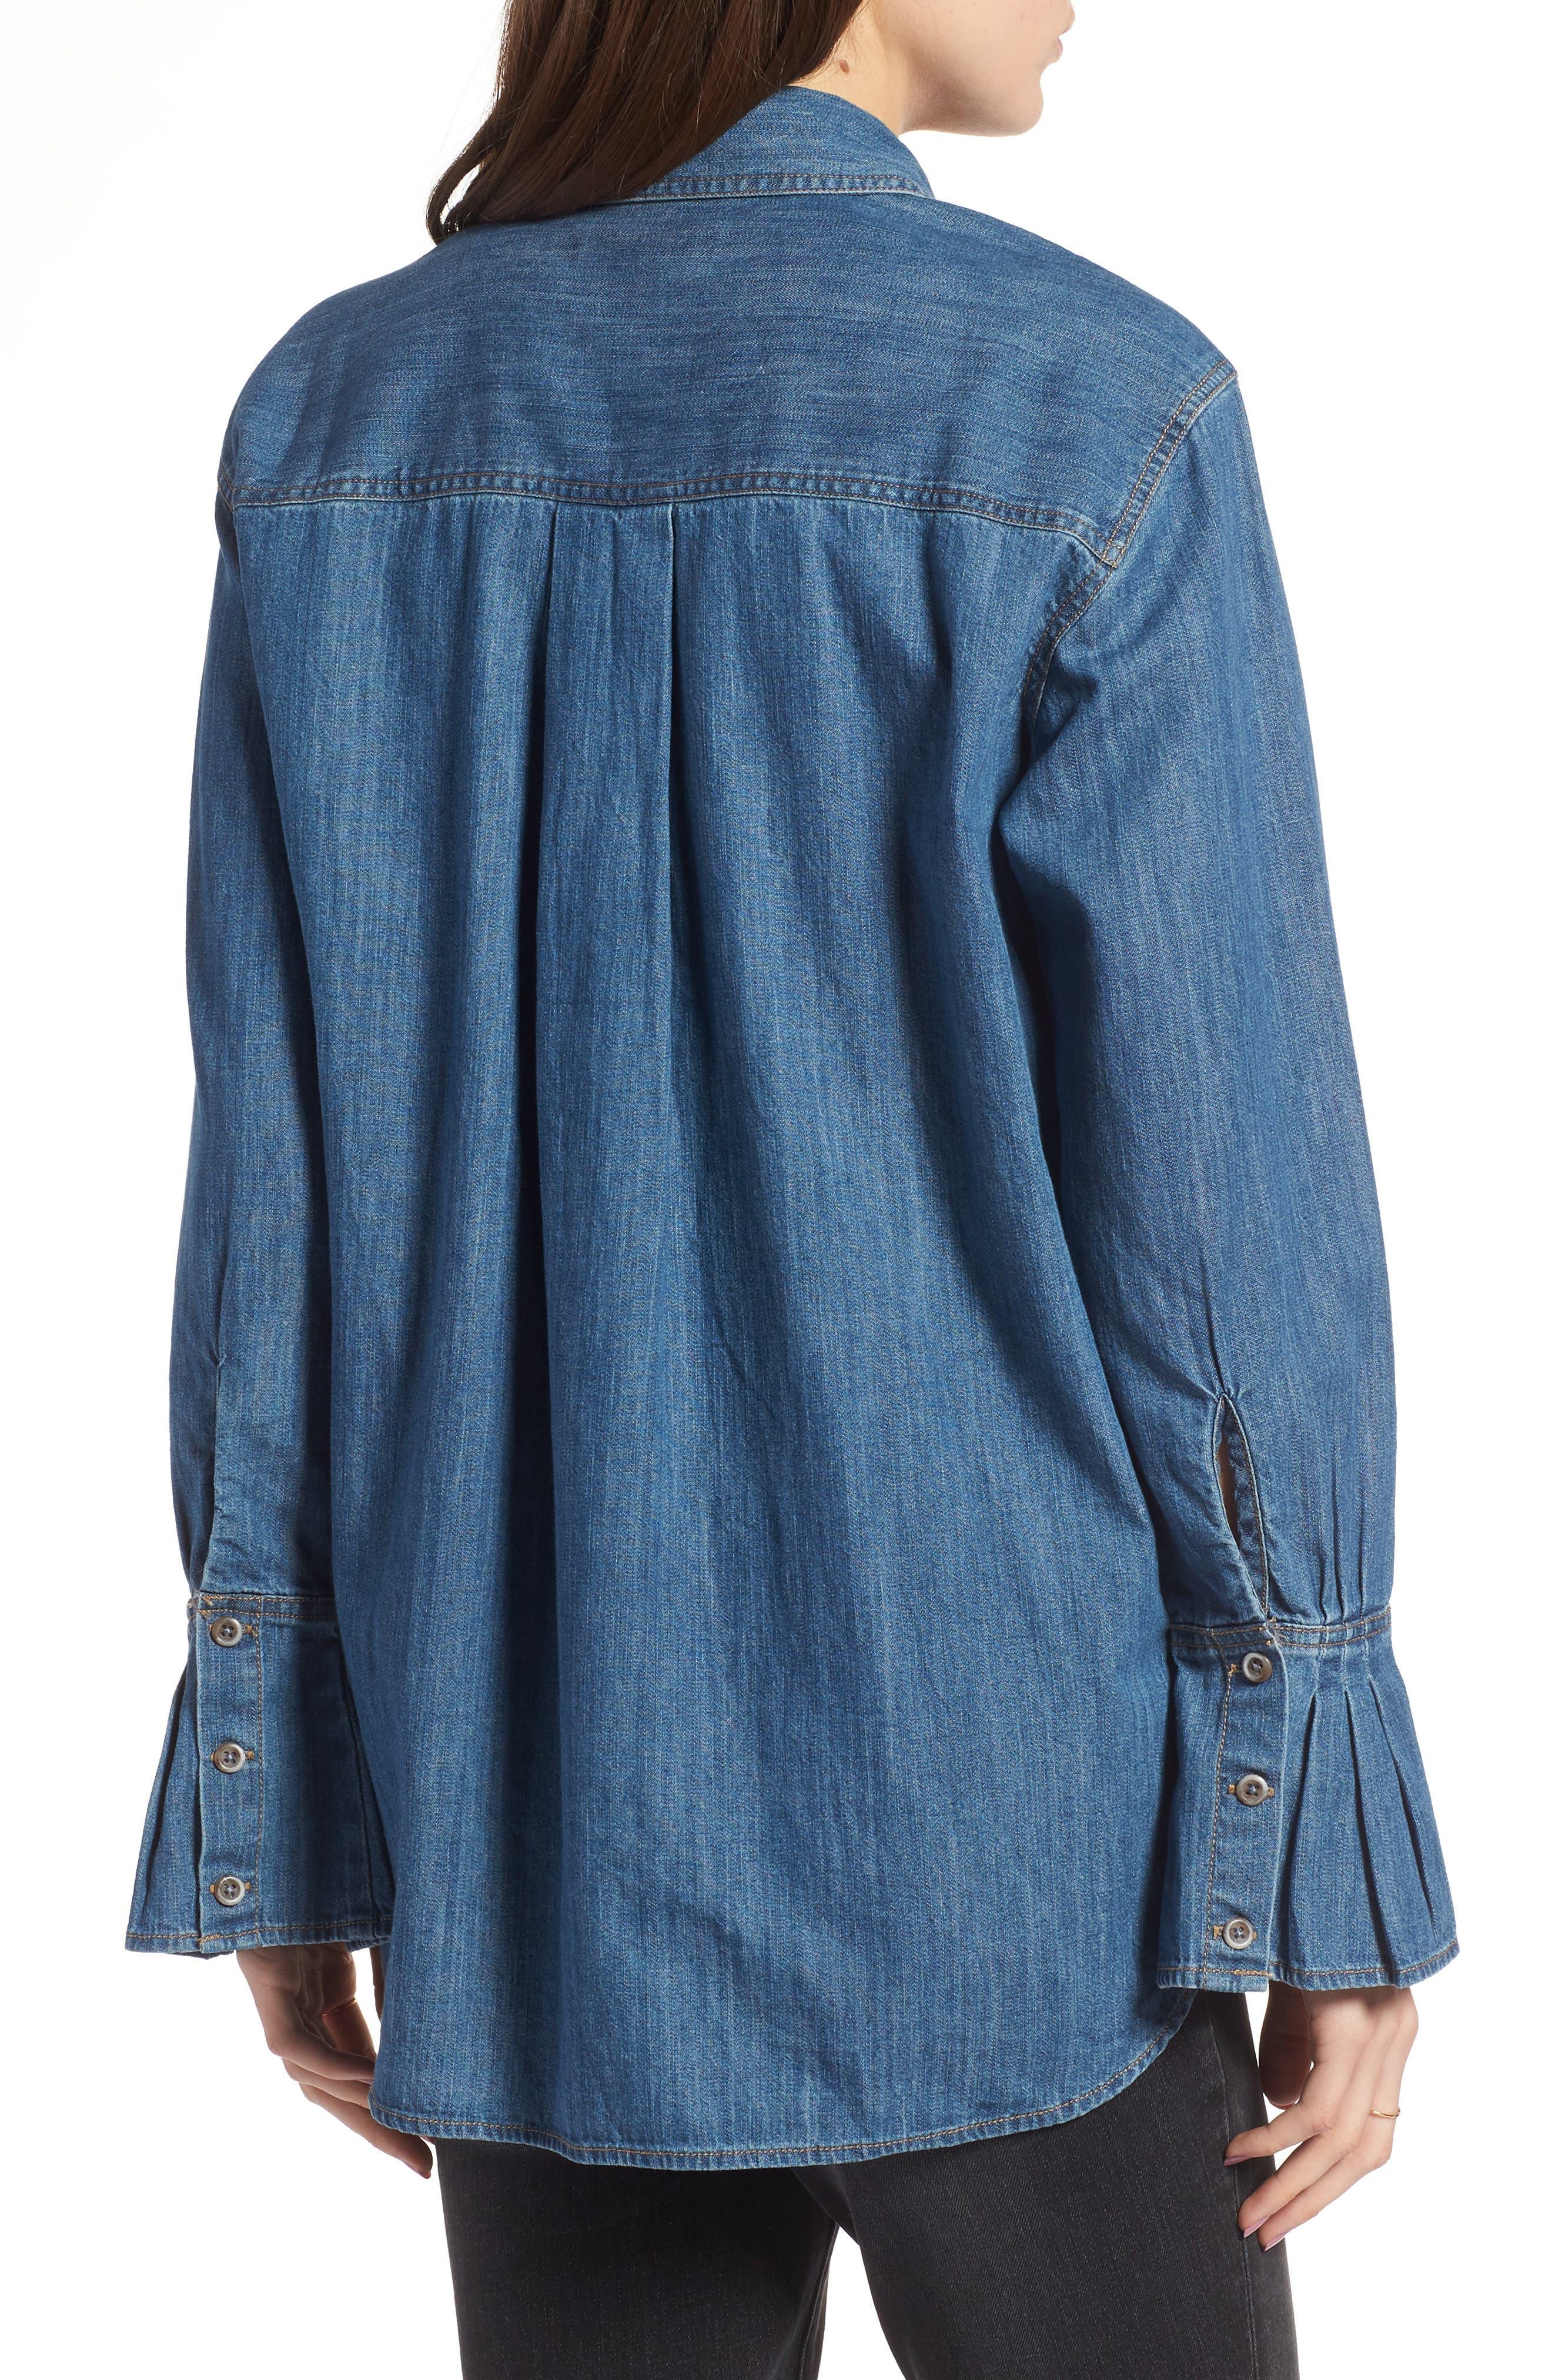 TREASURE & BOND,                             Pleated Cuff Chambray Shirt,                             Alternate thumbnail 2, color,                             420